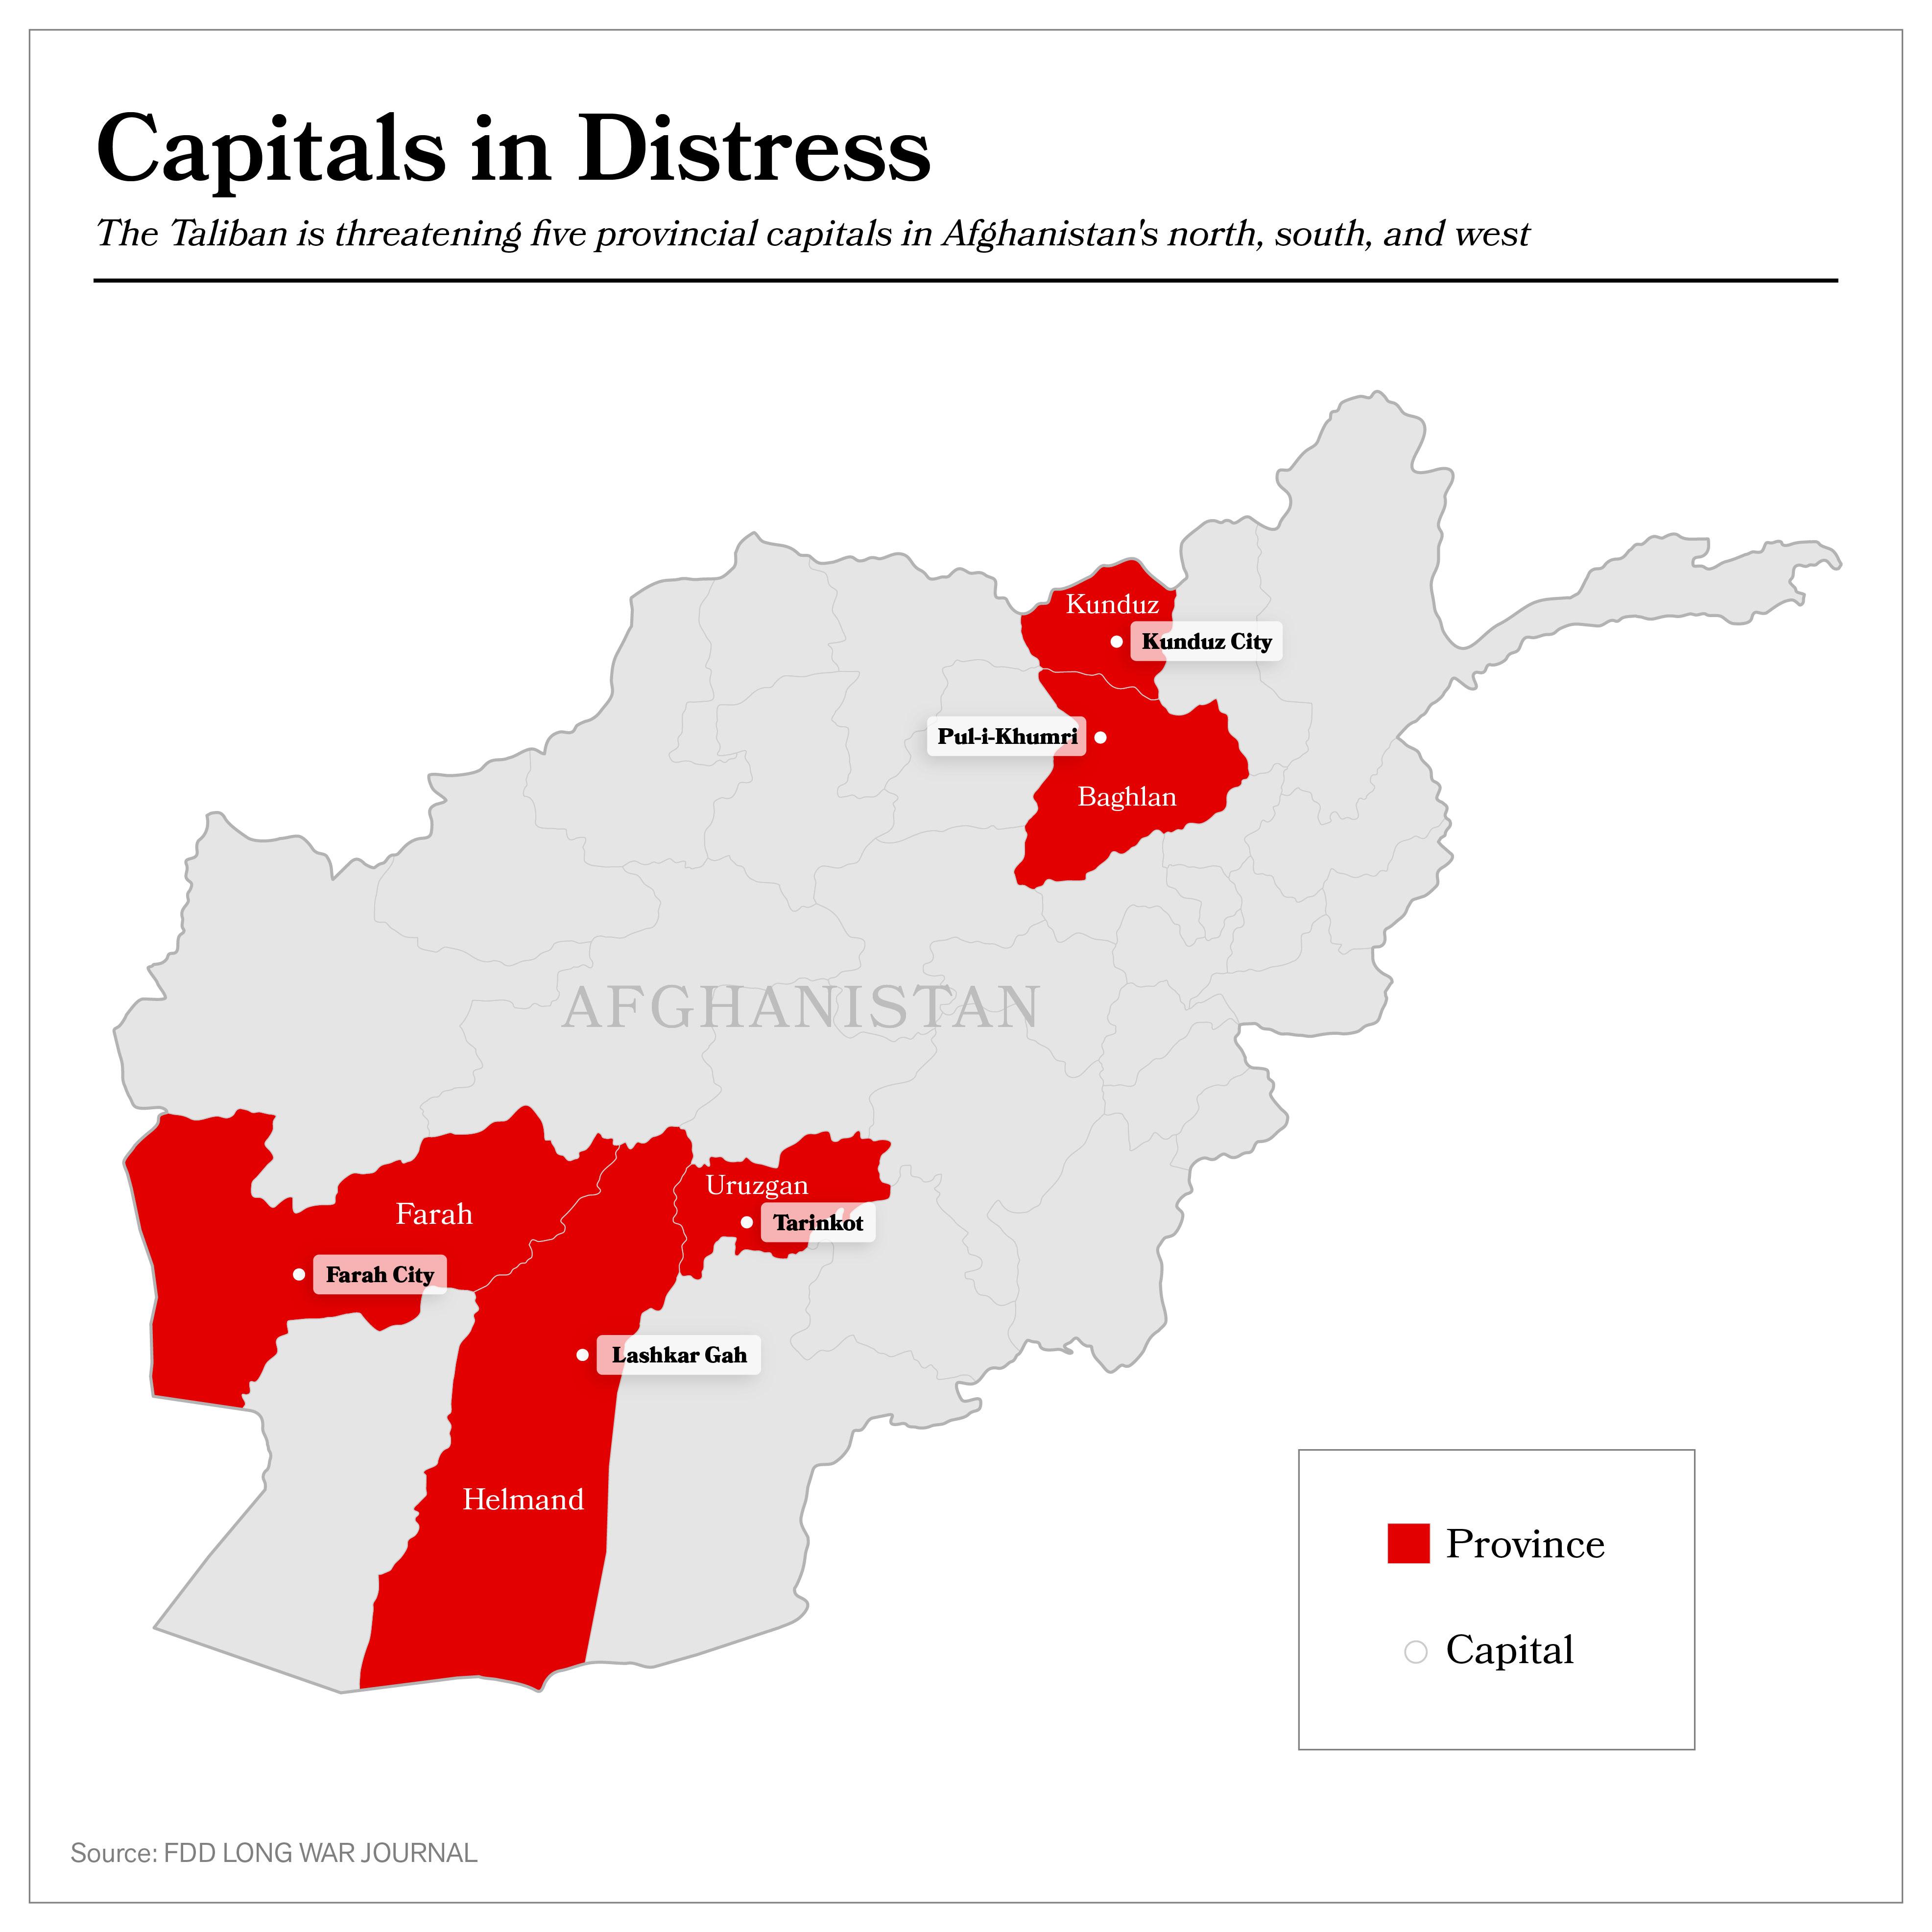 Taliban threatens 5 provincial capitals in Afghanistan | FDD's Long on panjshir province, ghazni province, baghlan province, takhar province, nangarhar province afghanistan map, nuristan afghanistan map, kapisa province afghanistan map, kapisa province, afghanistan khyber pass map, paktika province, khost province, wakhan corridor afghanistan map, gandamak afghanistan map, puli khumri afghanistan map, kathmandu afghanistan map, kandahar afghanistan map, nangarhar province, kabul province, fallujah afghanistan map, helmand afghanistan map, balkh province, istalif afghanistan map, laghman province, paktika province afghanistan map, afghanistan rivers map, panjshir province afghanistan map, gardez afghanistan map, badakhshan province, herat afghanistan map, helmand province, kandahar province, mazar-e sharif, herat province, islamabad afghanistan map, bala murghab afghanistan map, singesar afghanistan map, kunar province,